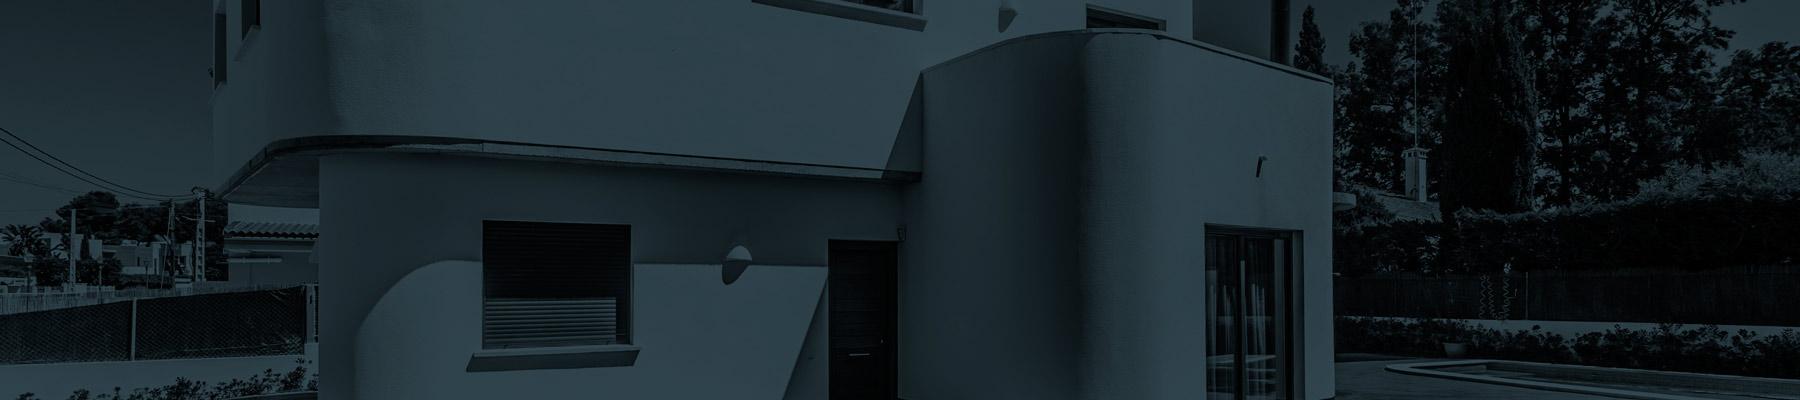 grupovalseco-reforma-vivienda-slider-171800